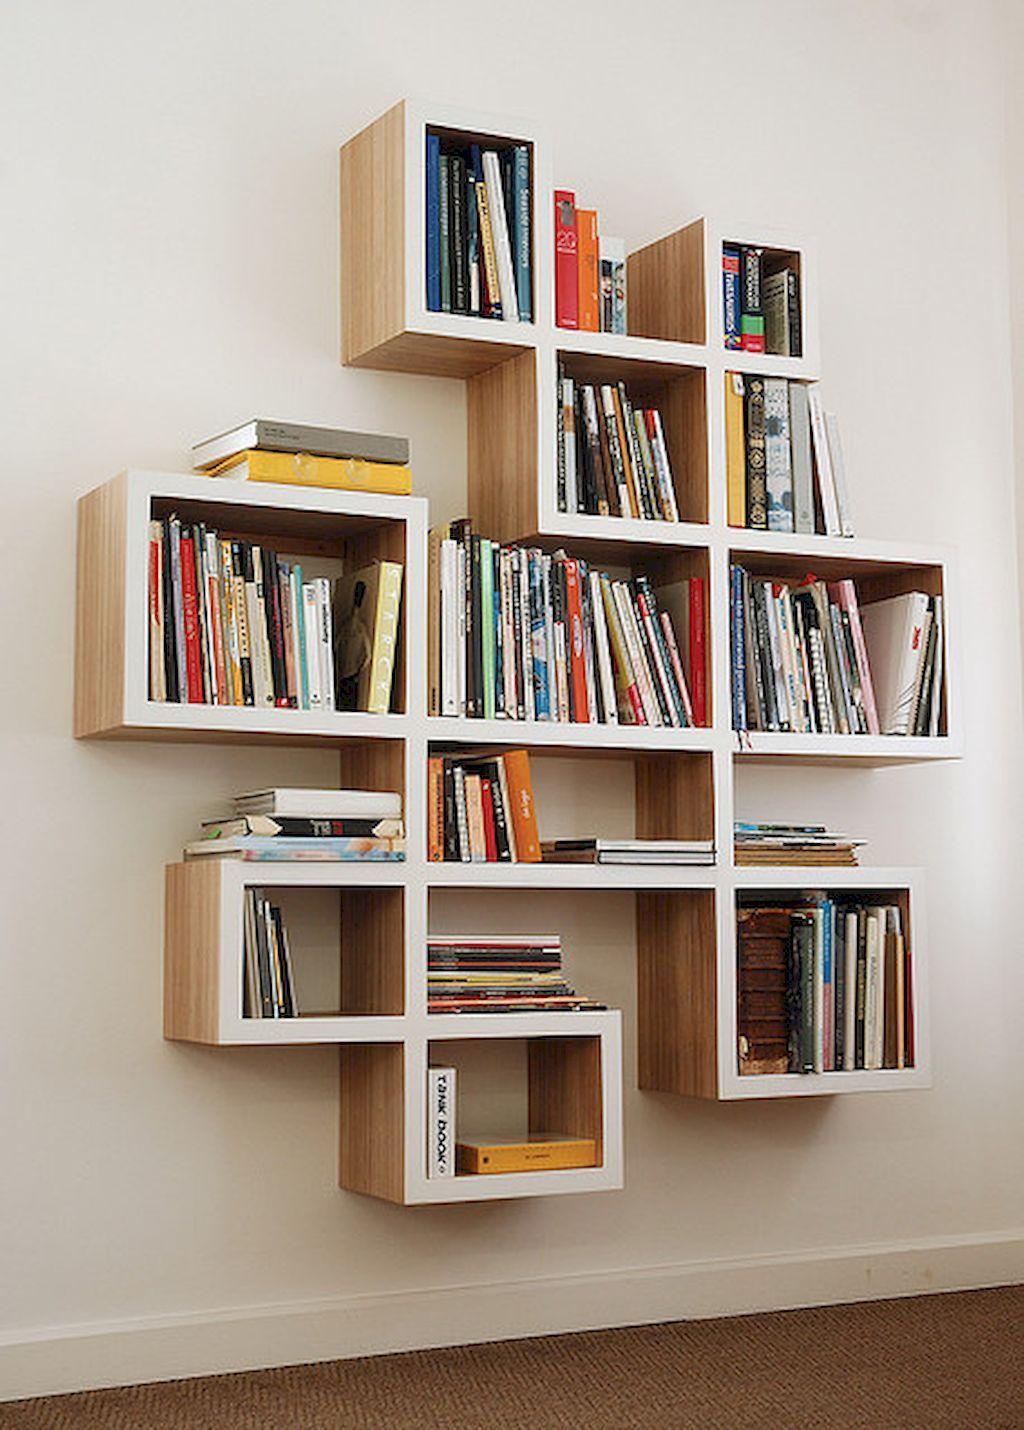 Cool 60 cheap diy wall shelves floating ideas https roomaniac com 60 cheap diy wall shelves floating ideas